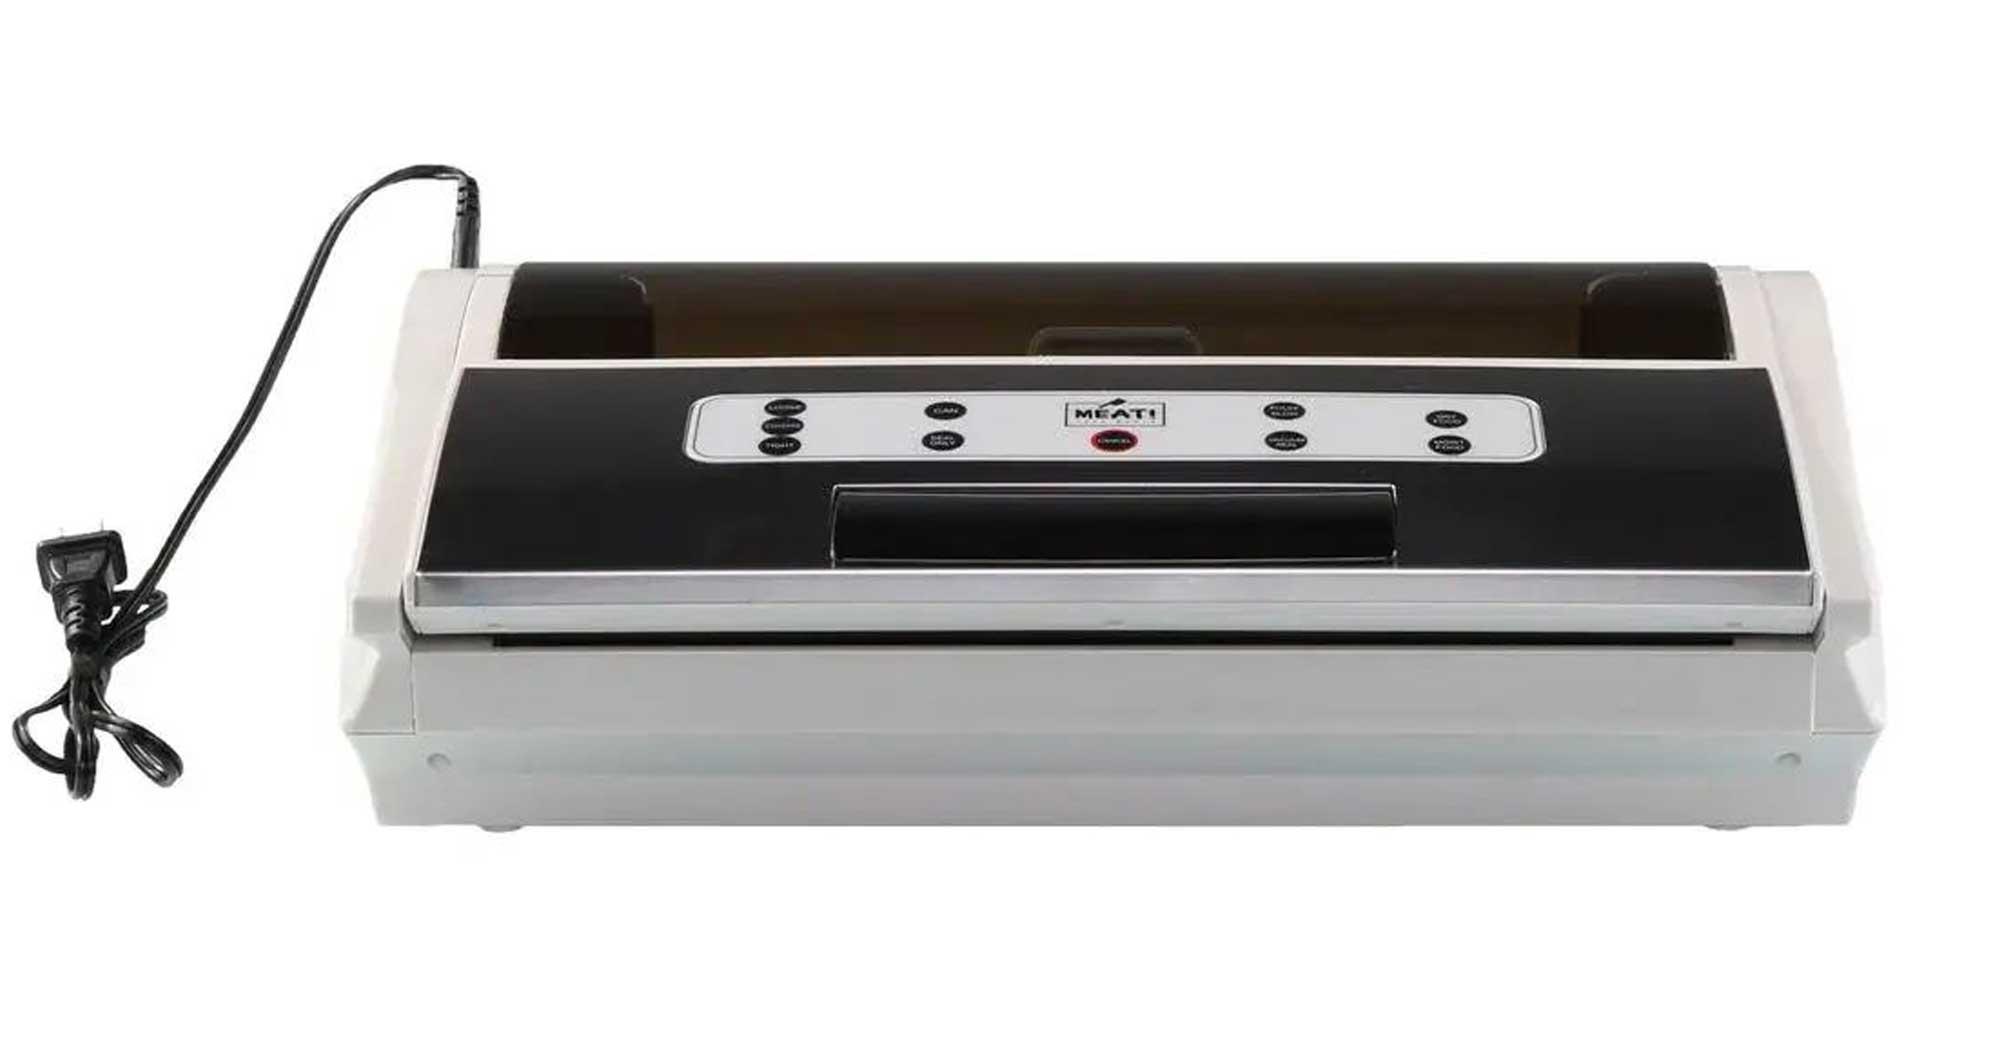 MEAT PRO External Vacuum Sealer